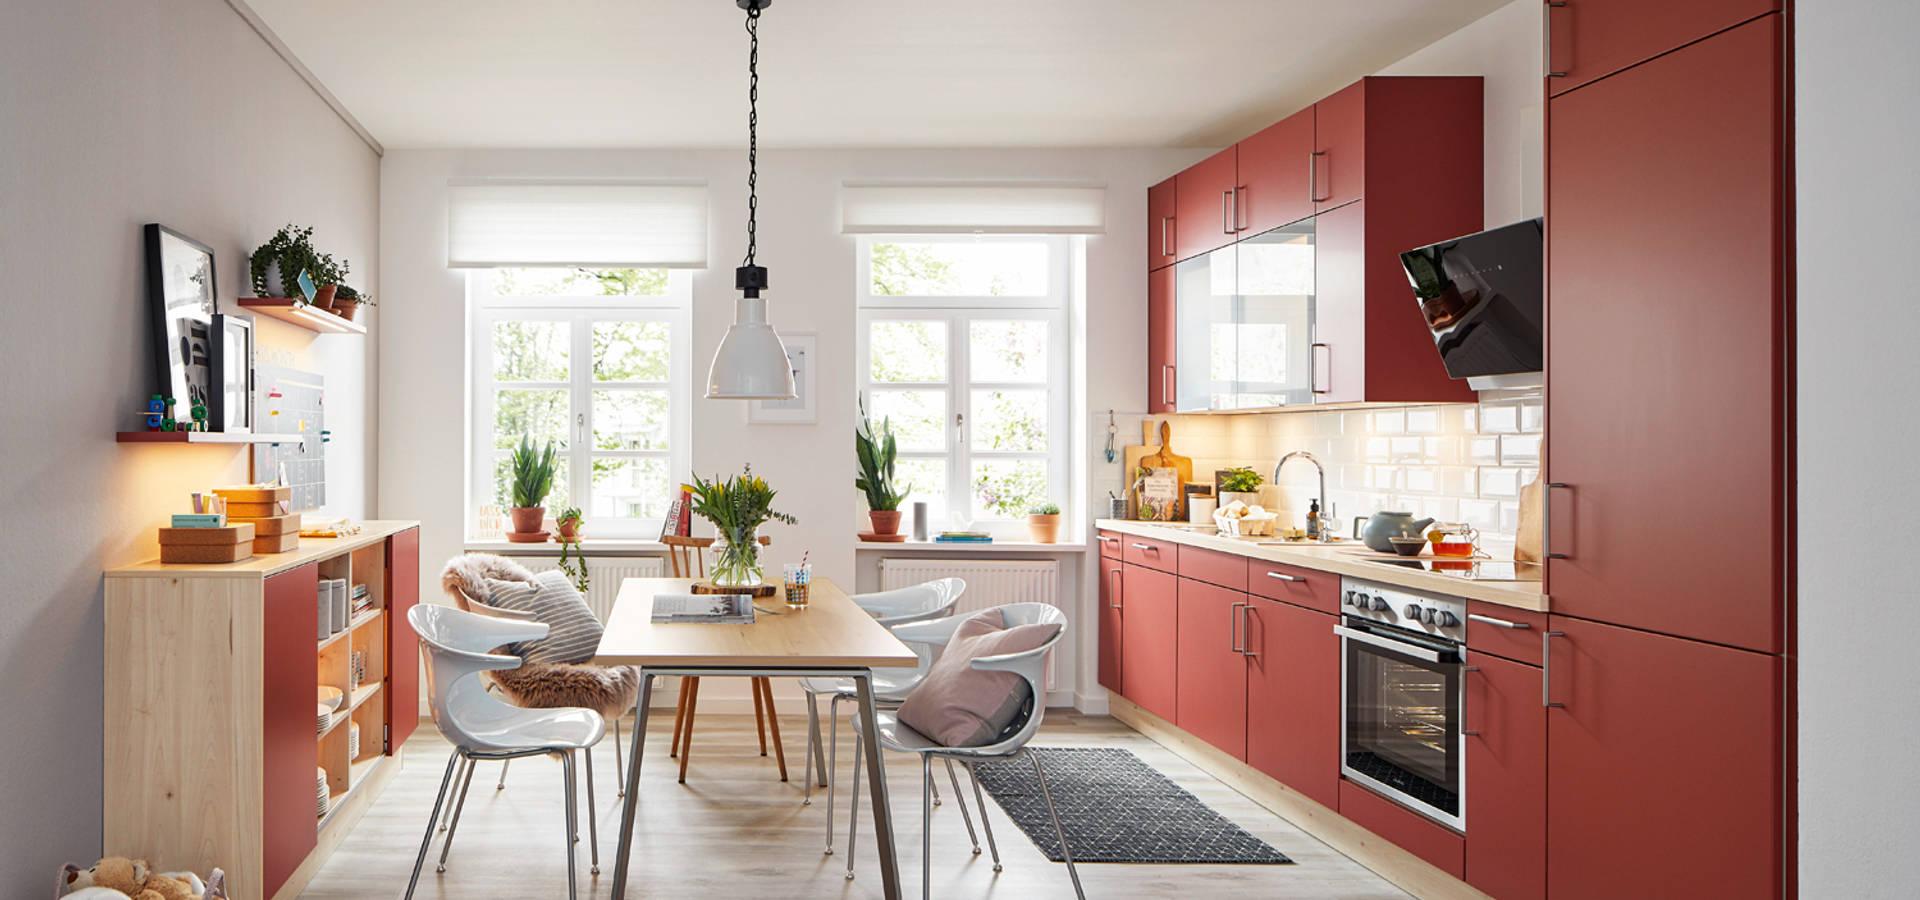 Spitzhüttl Home Company